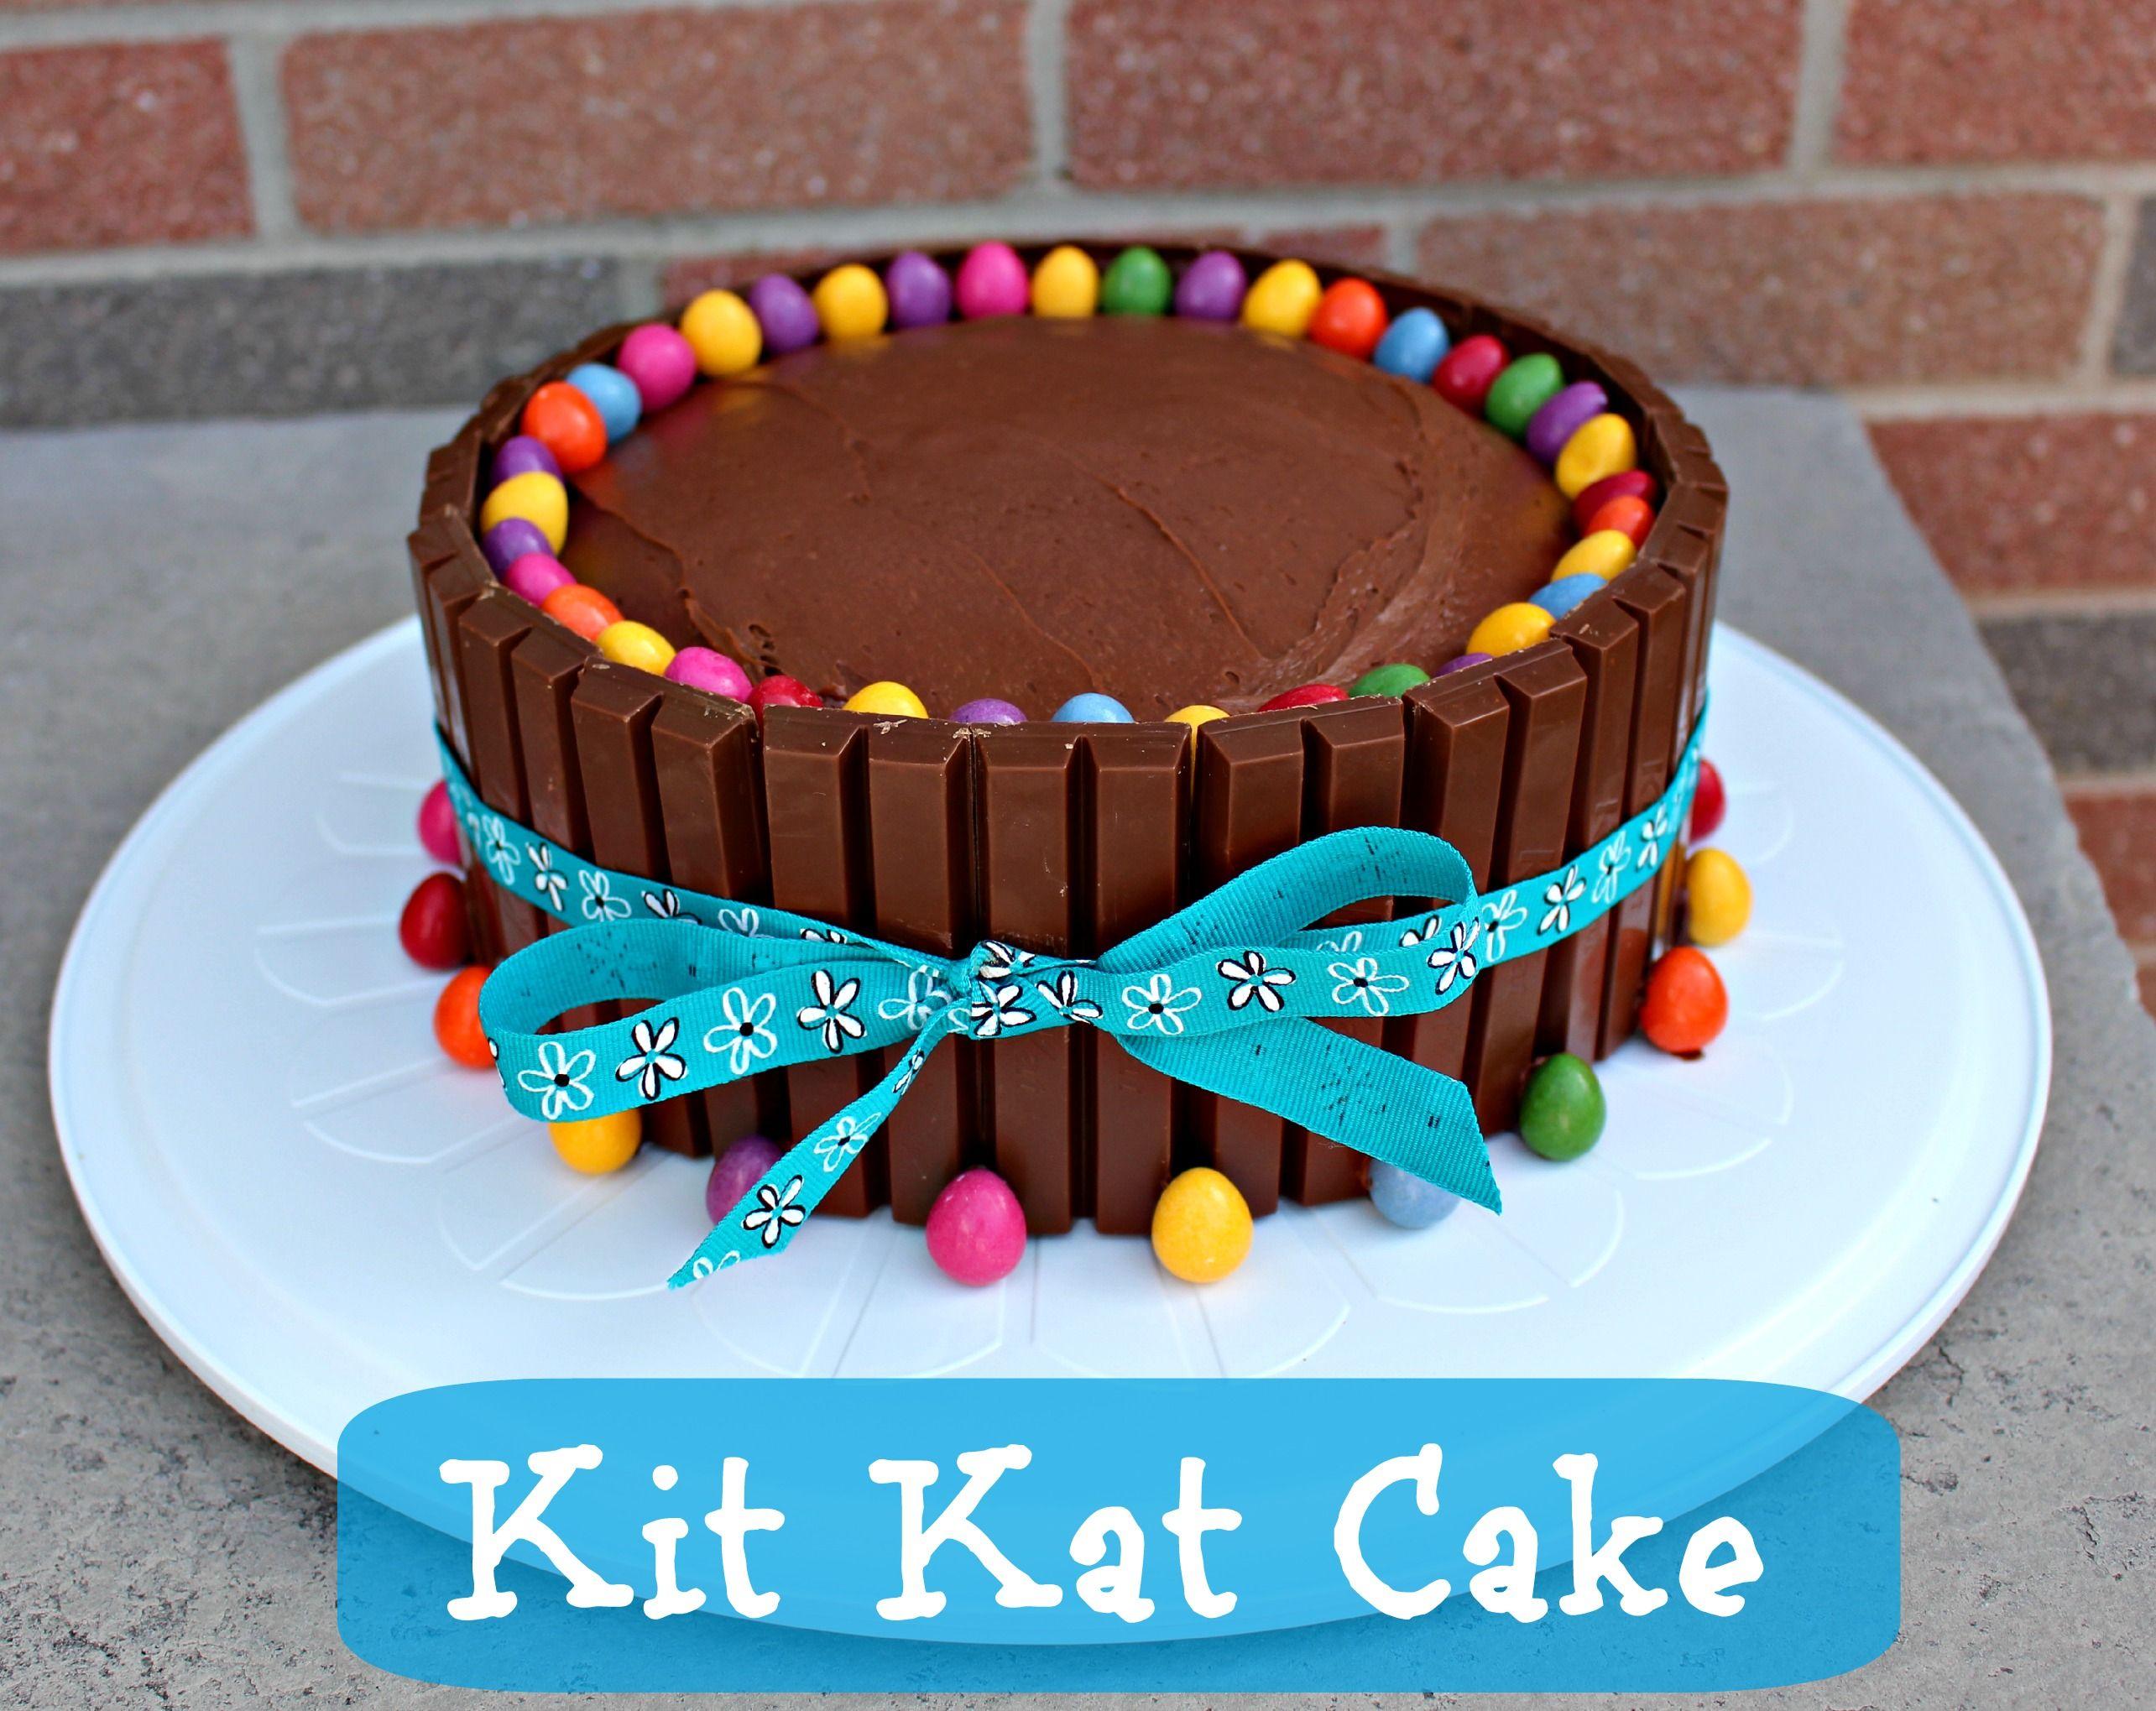 Kit Kat Cake Recipe Easy birthday cake recipes